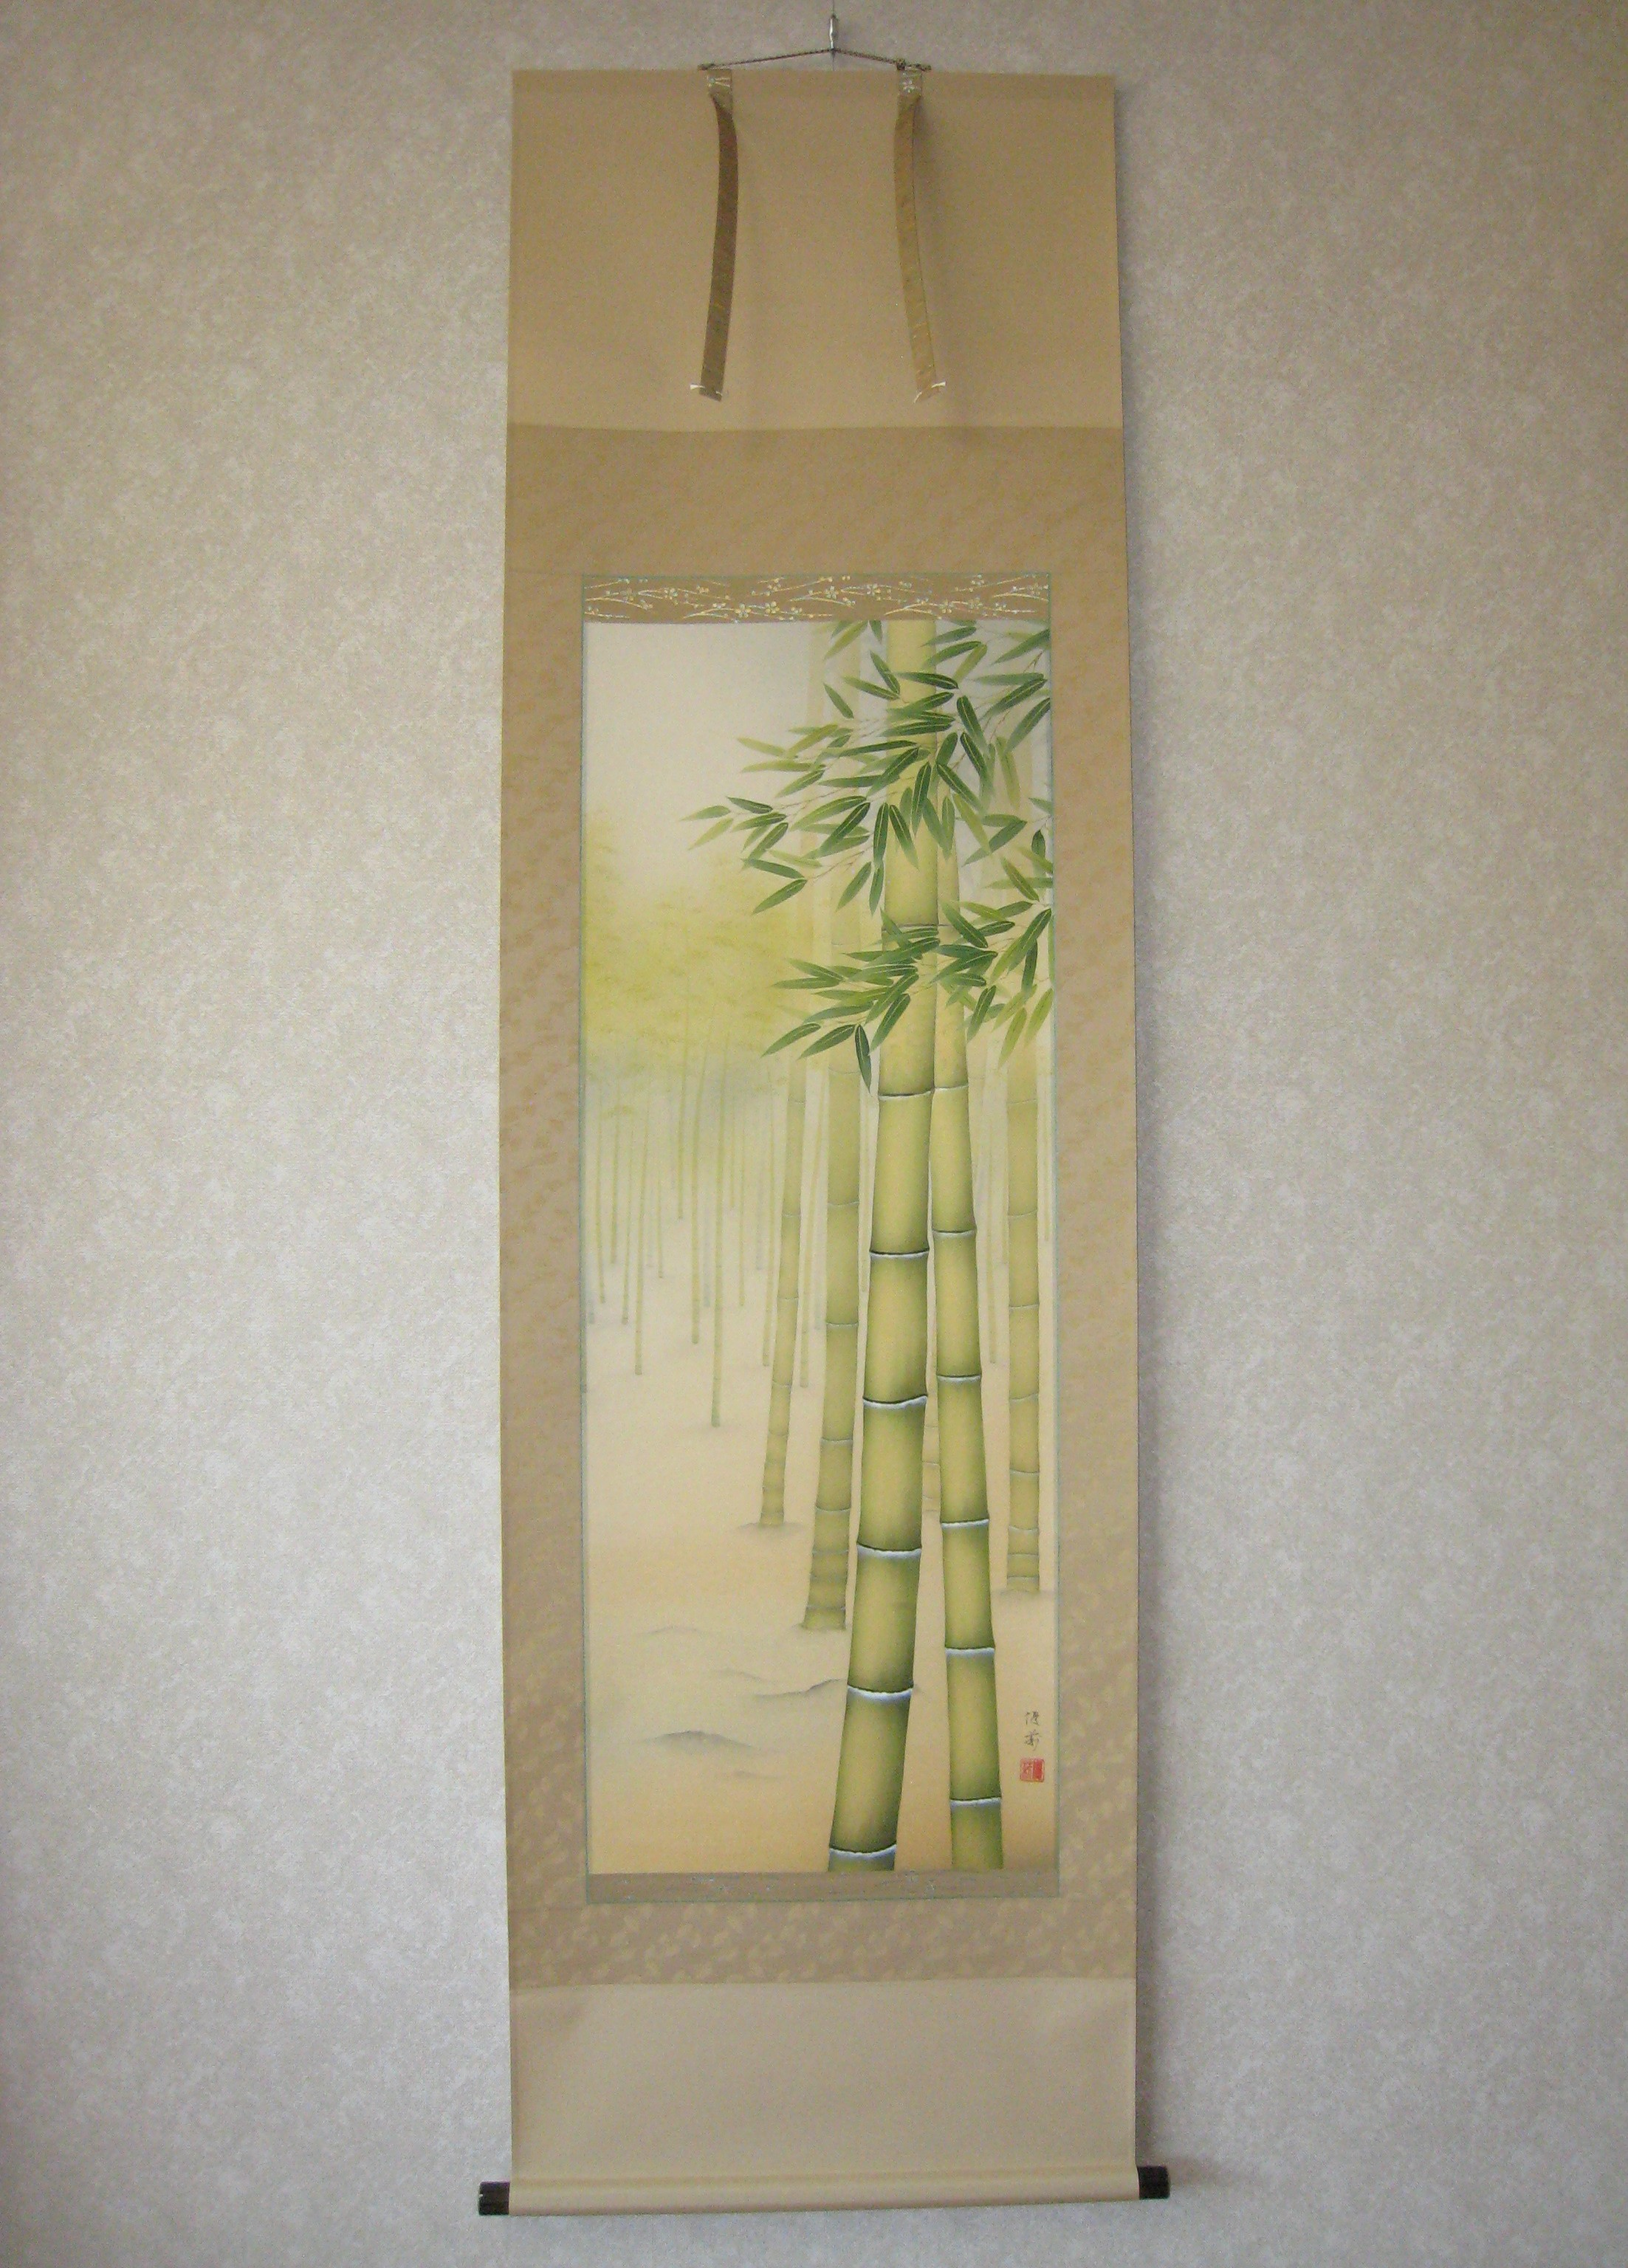 掛け軸 吉祥竹林図◆鈴木優莉